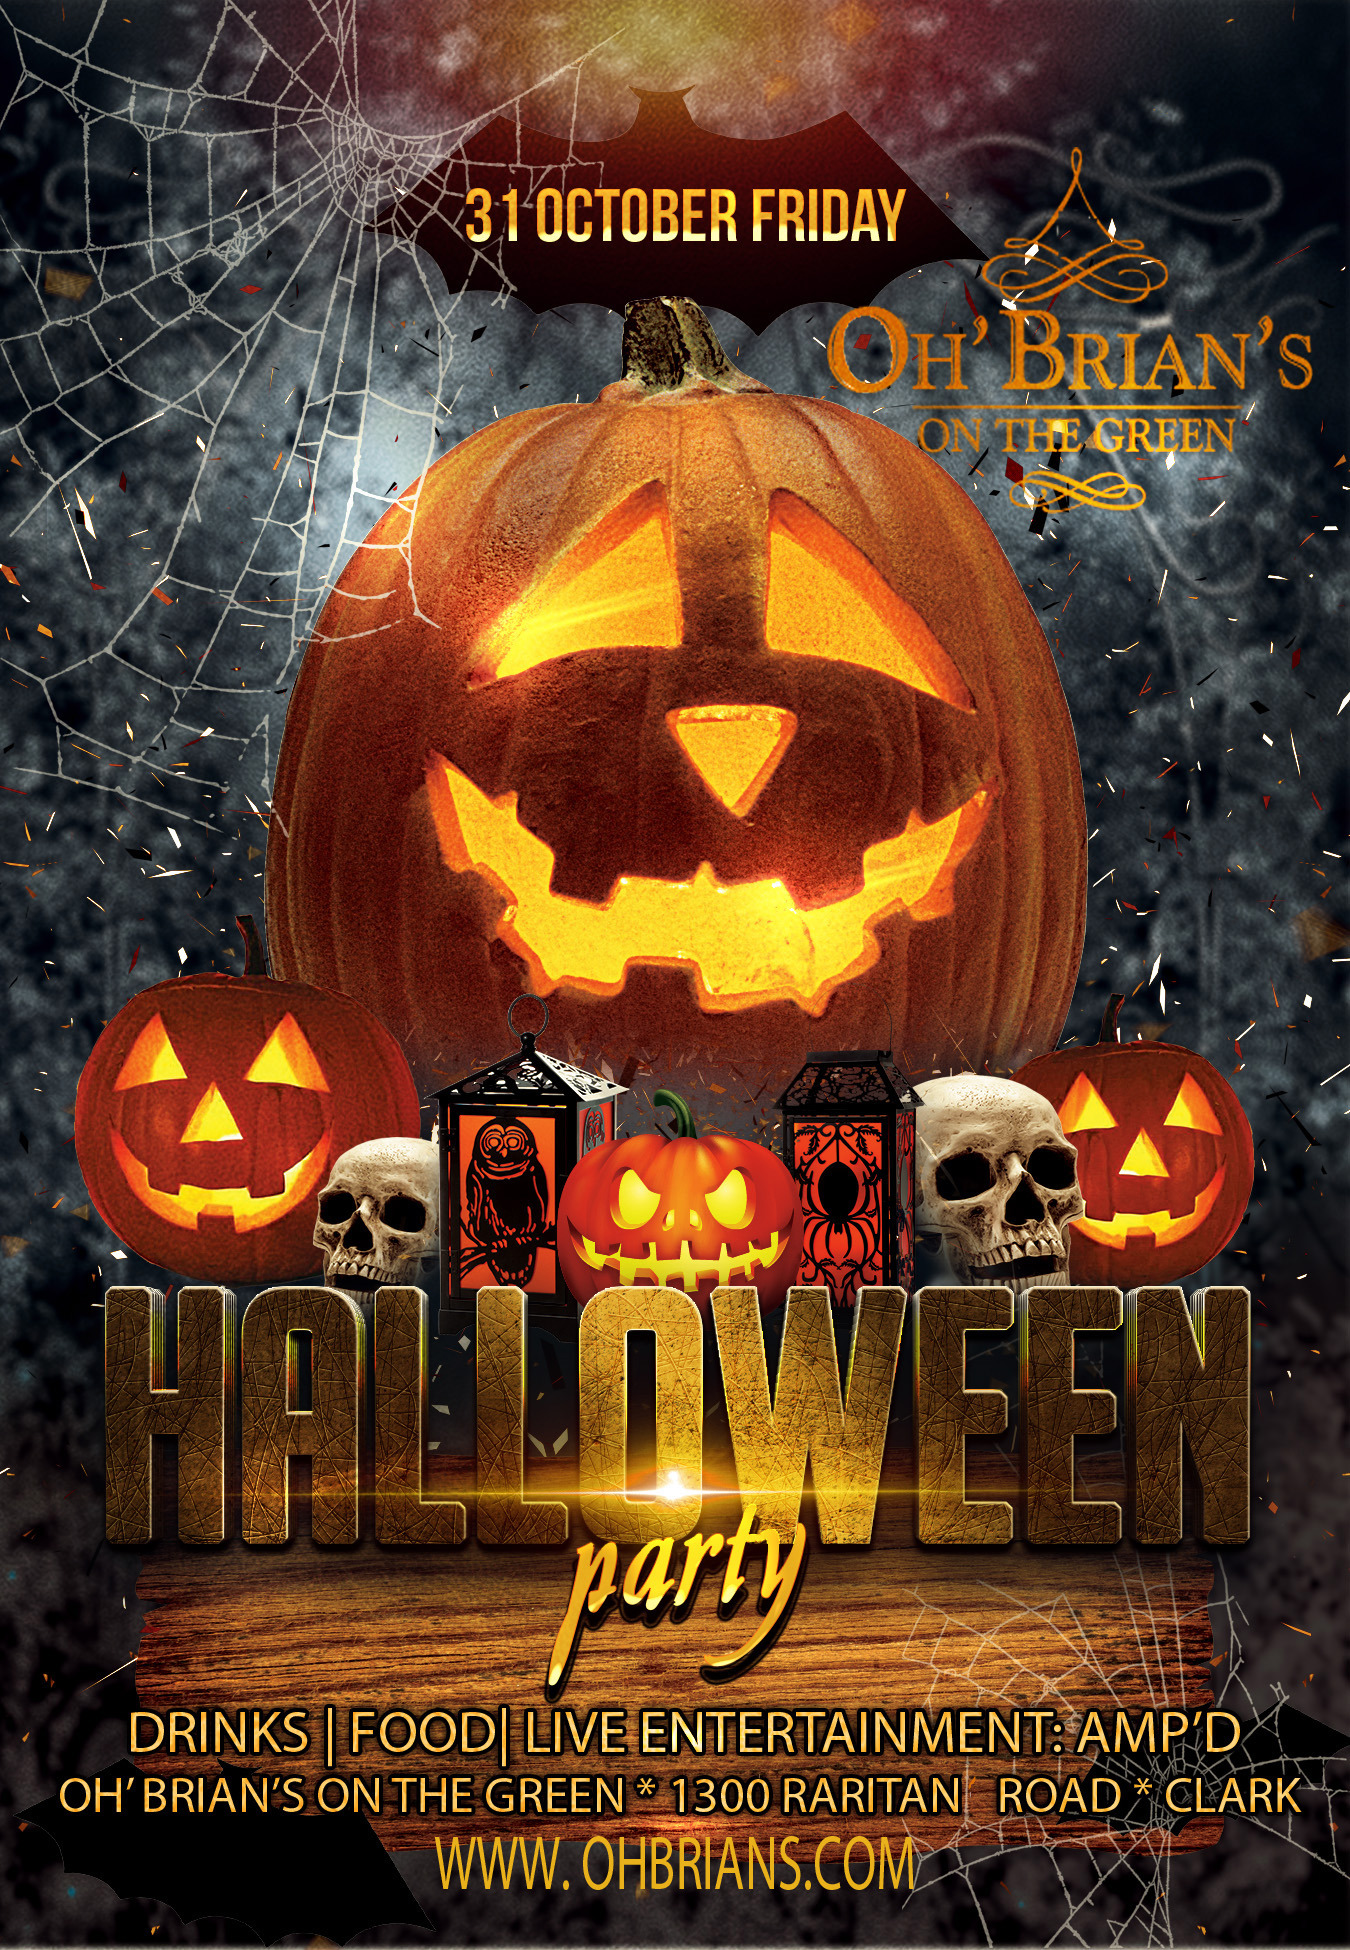 69b967bea09865a3f77f_Oh__Brian_s_Halloween_Pumpkins_party_edited-1.jpg